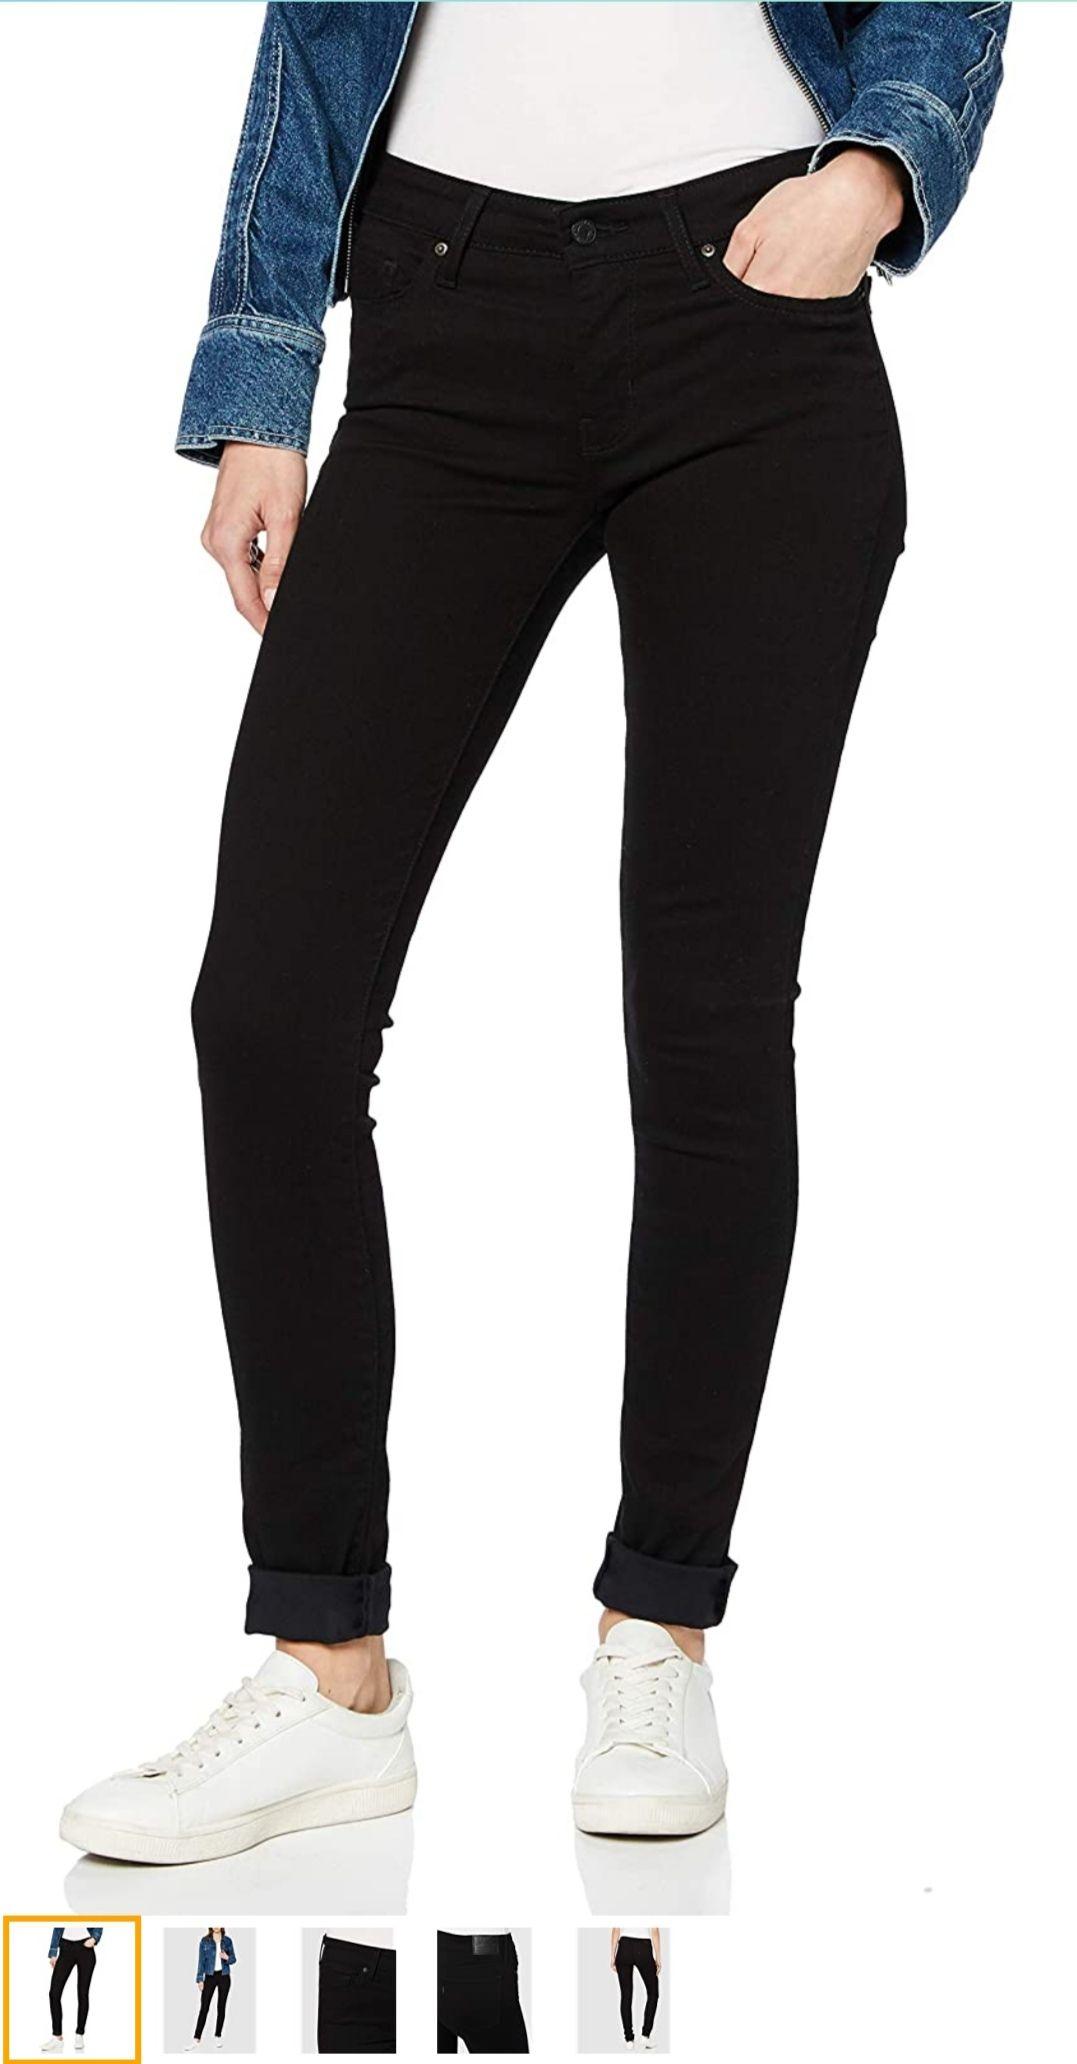 Levi's Damen 711 Skinny Jeans Black sheep Grösse 23 oder Mädchen 152/158